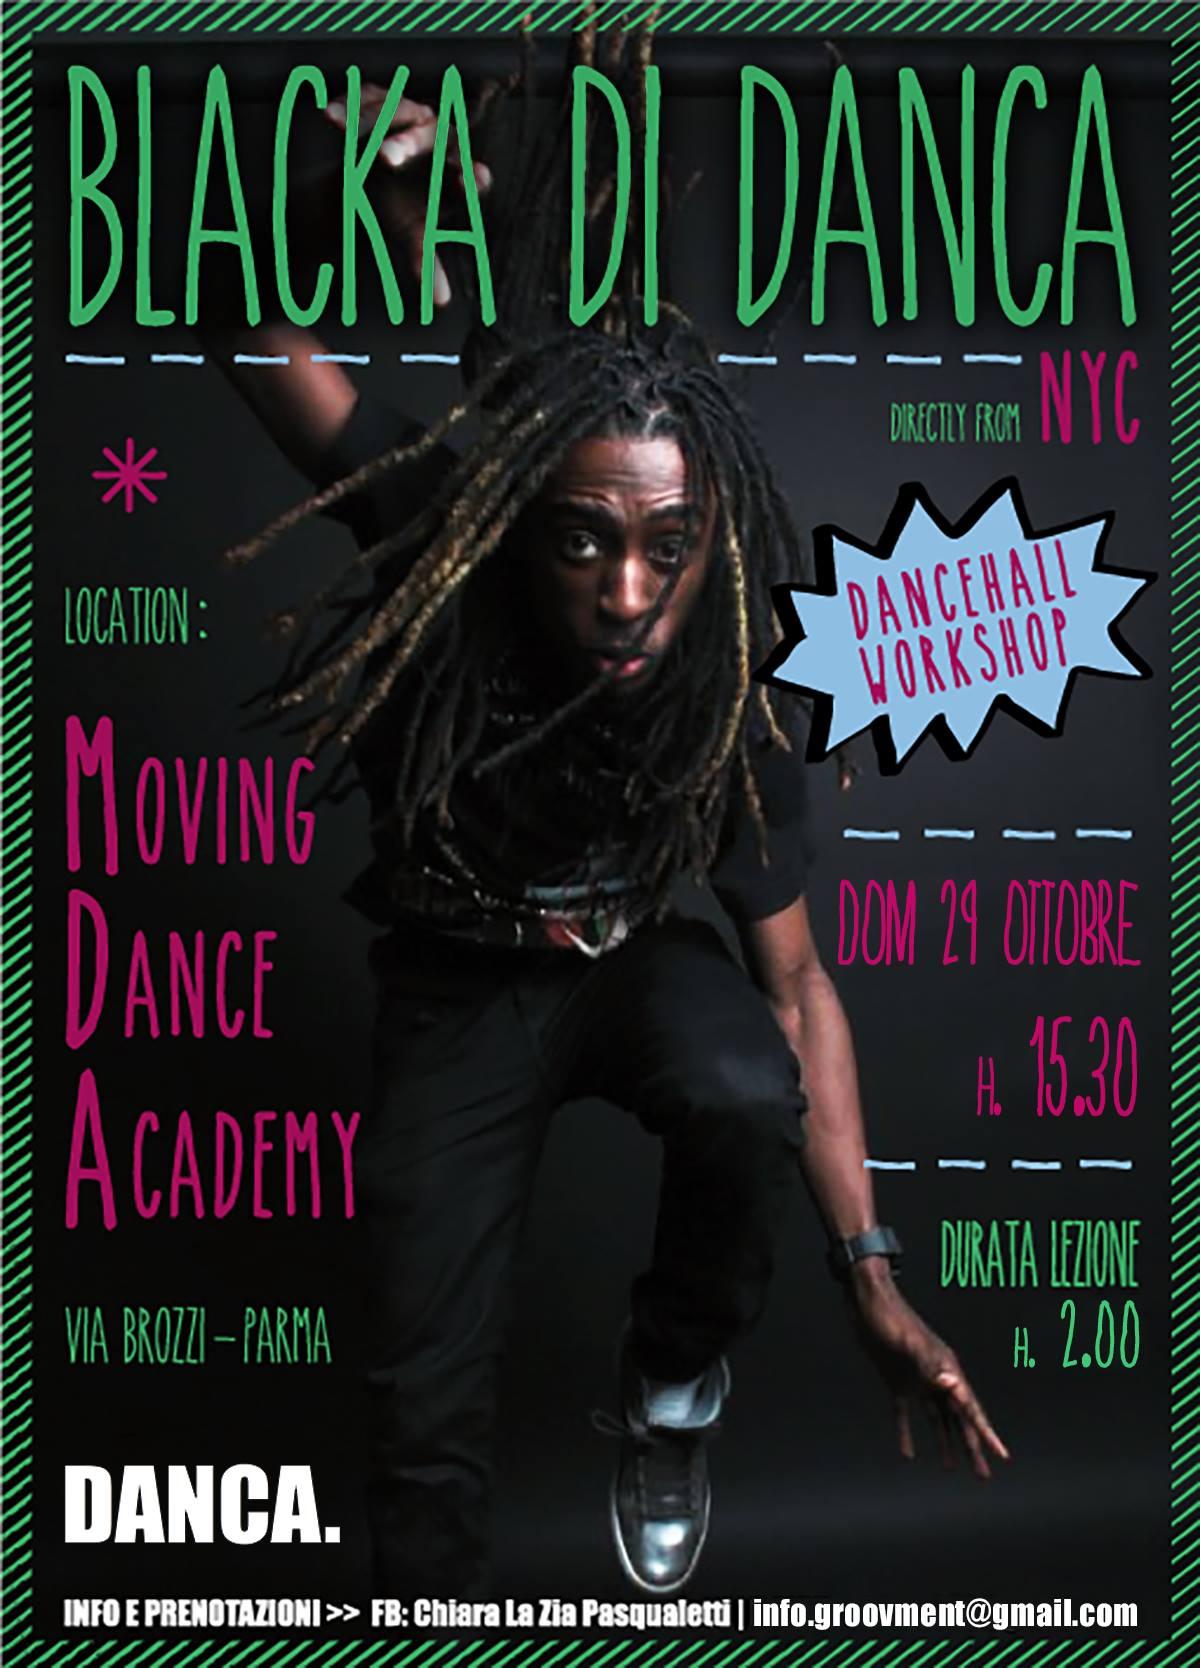 Dancehall Workshop with Blacka di Danca Parma